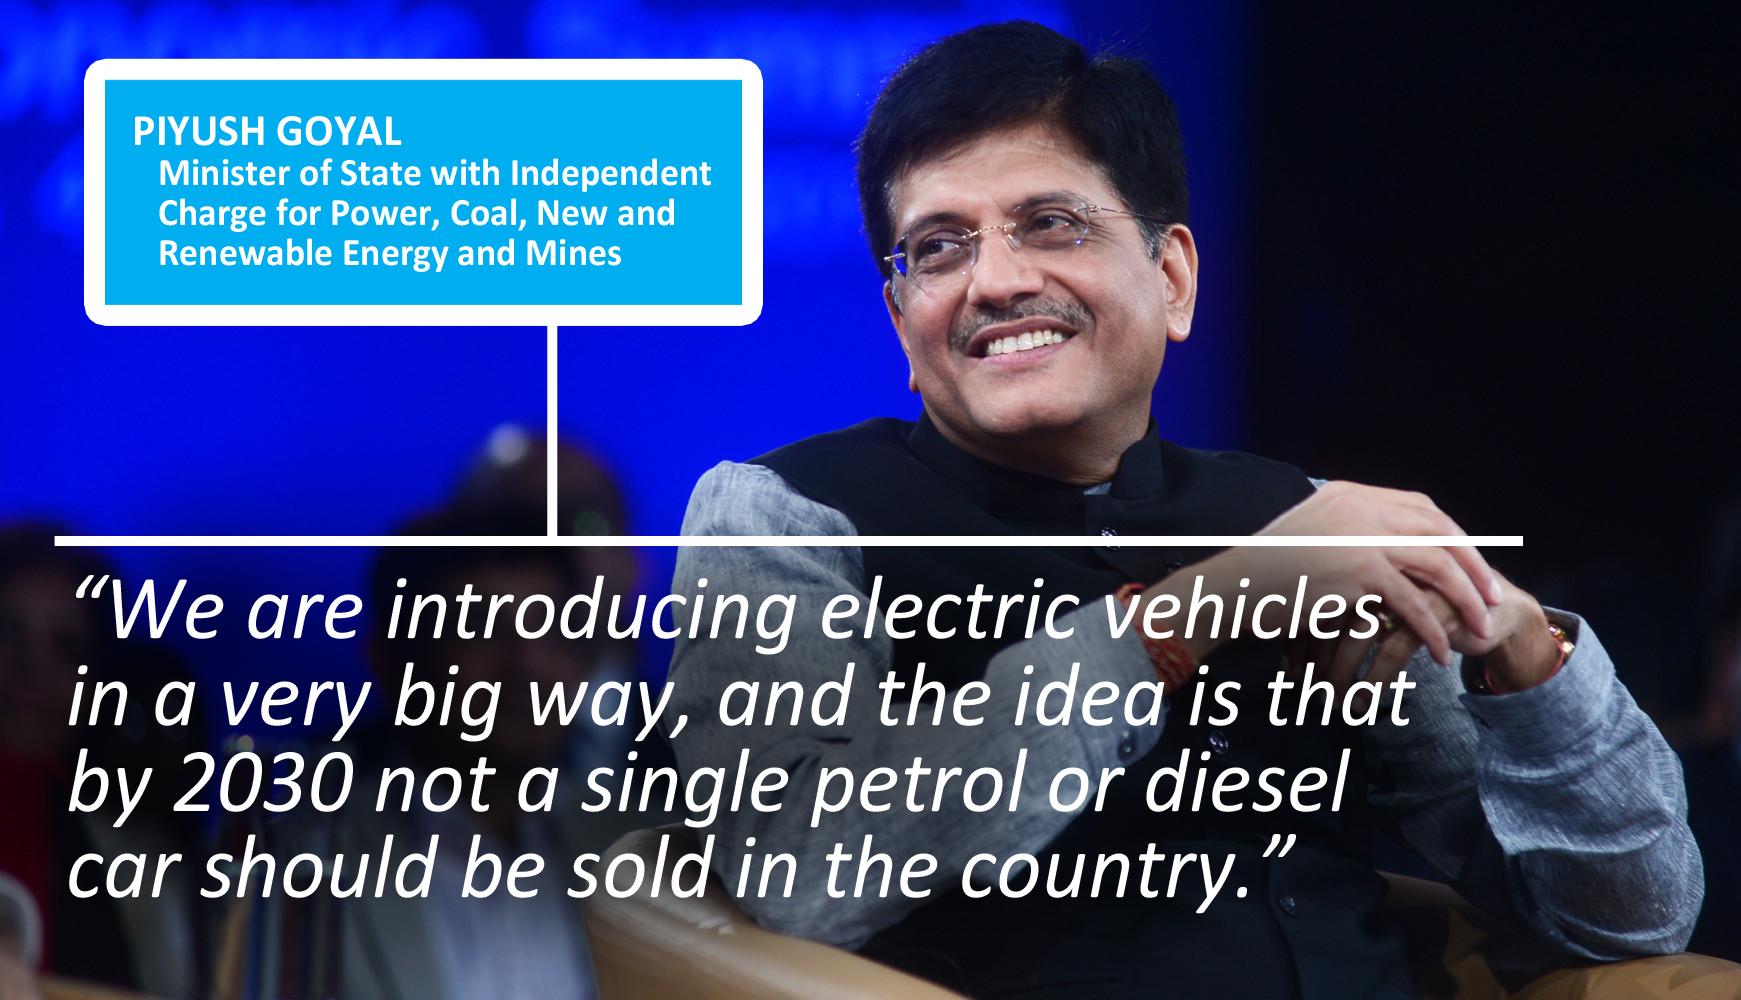 Piyush Goyal Quote.jpg